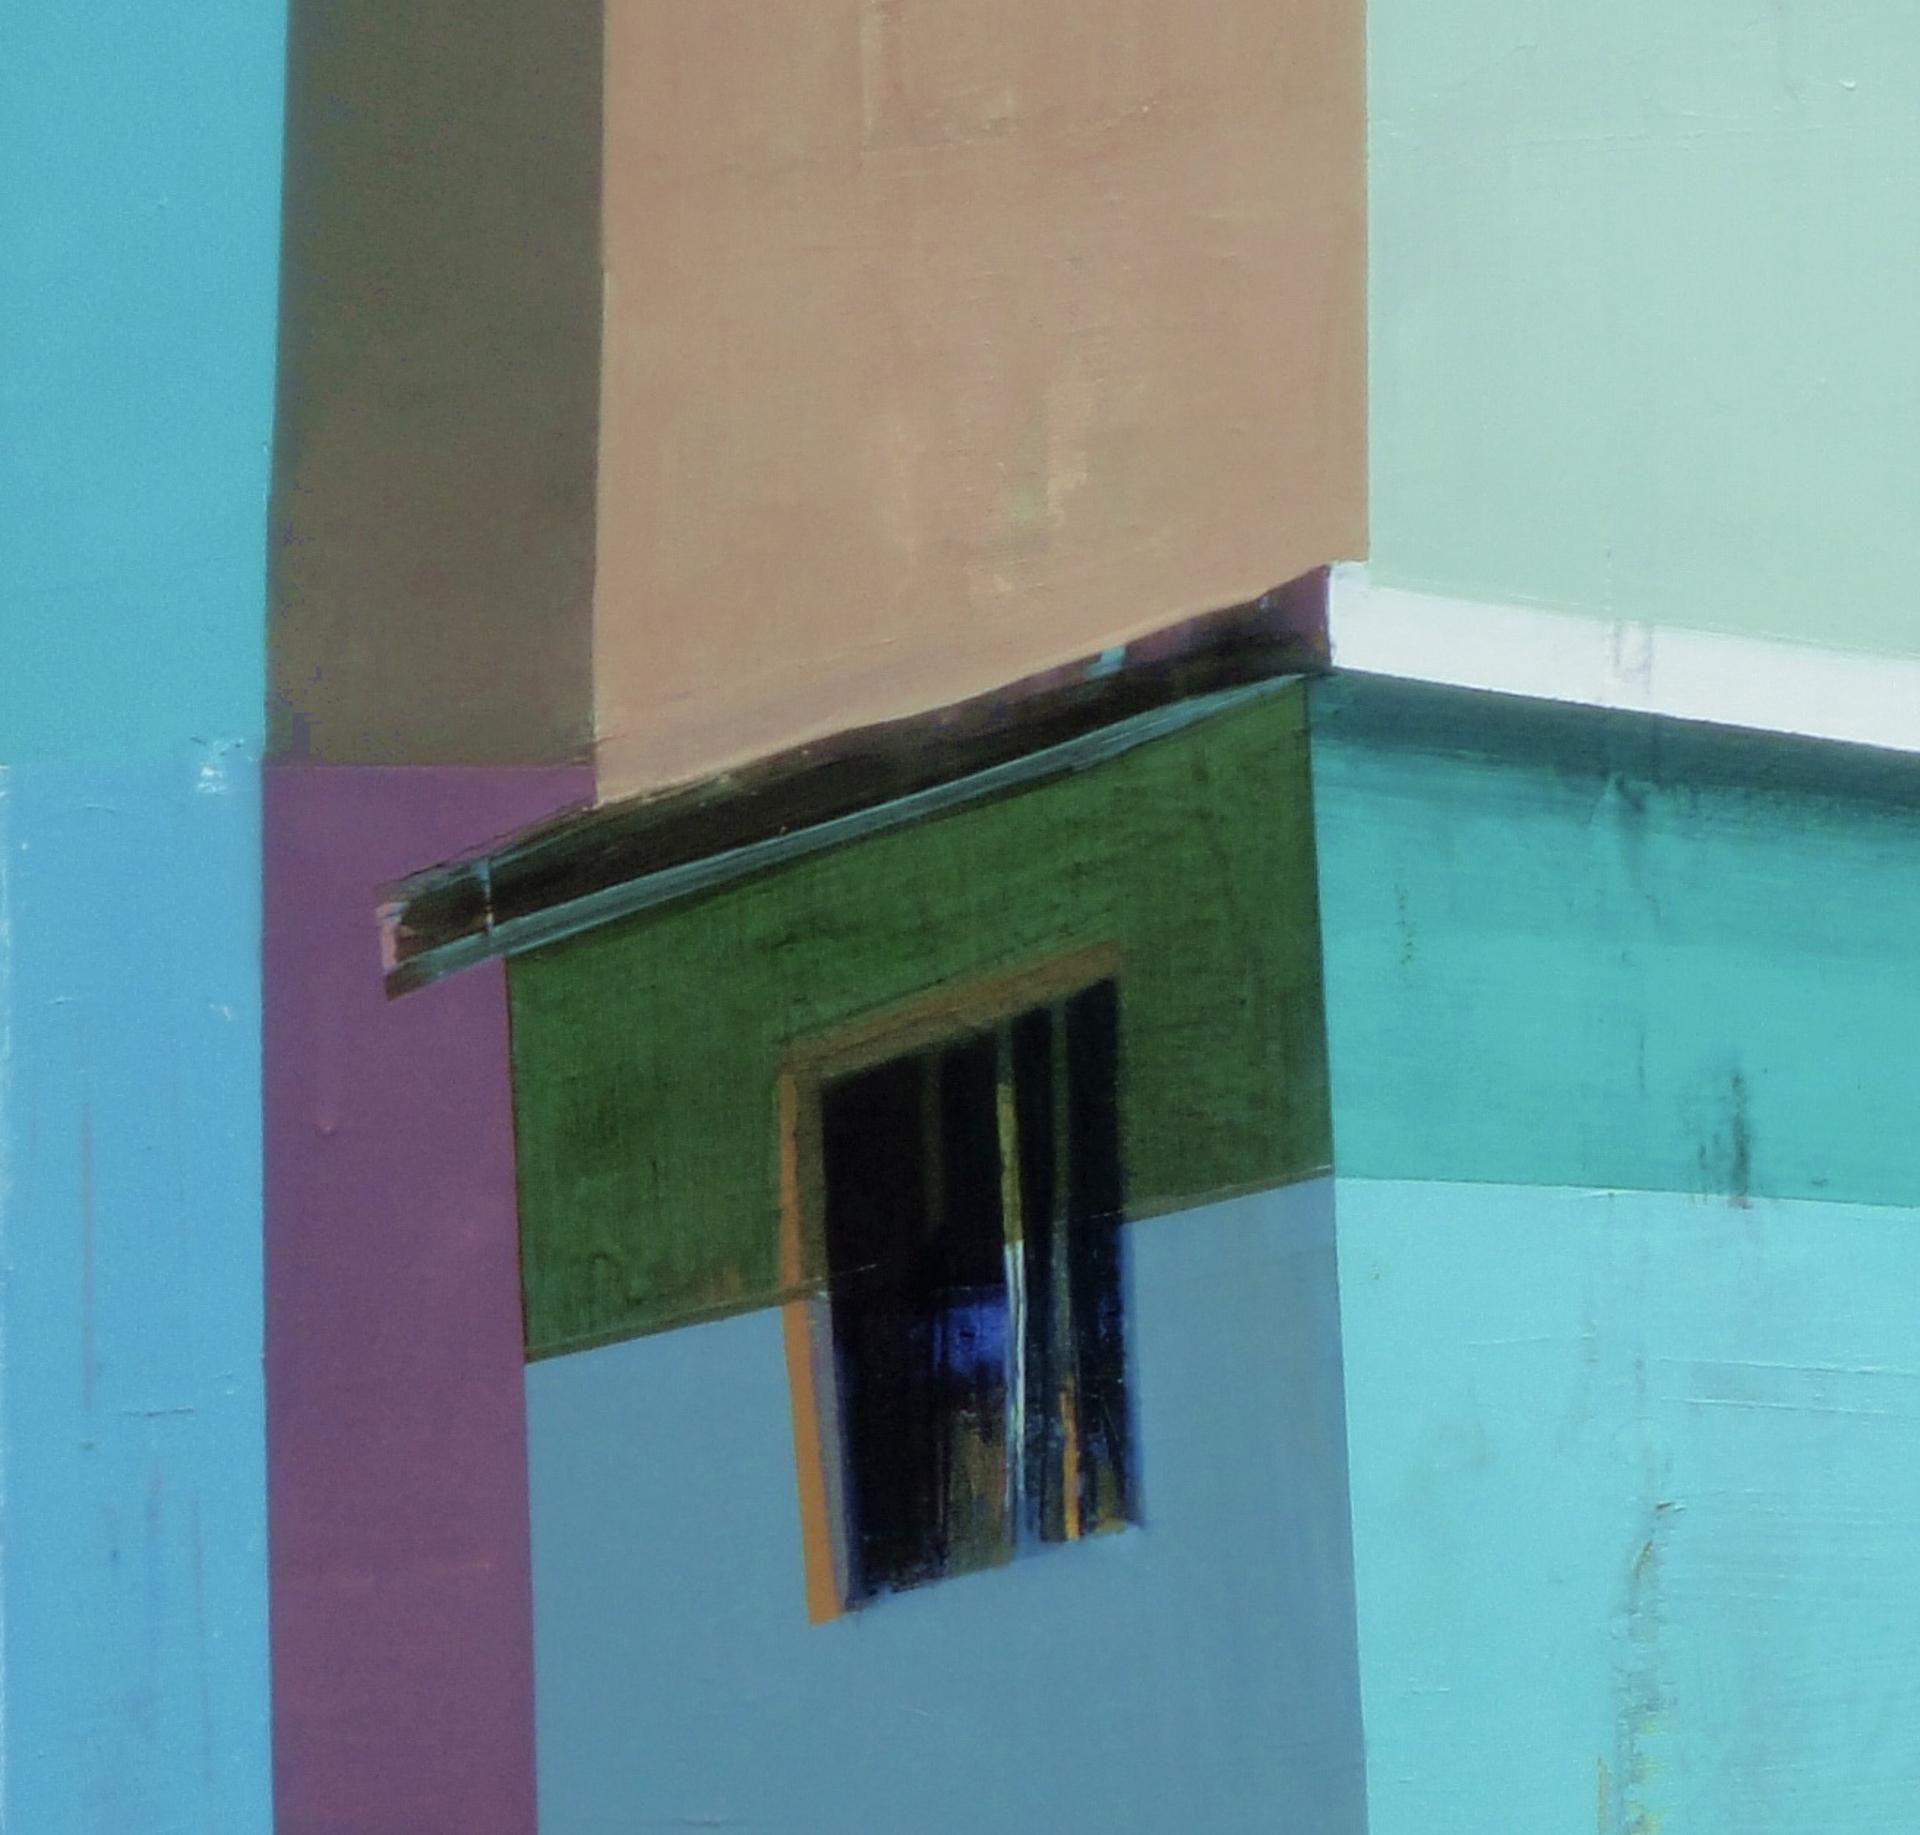 Una Casa Verde by Siddharth Parasnis